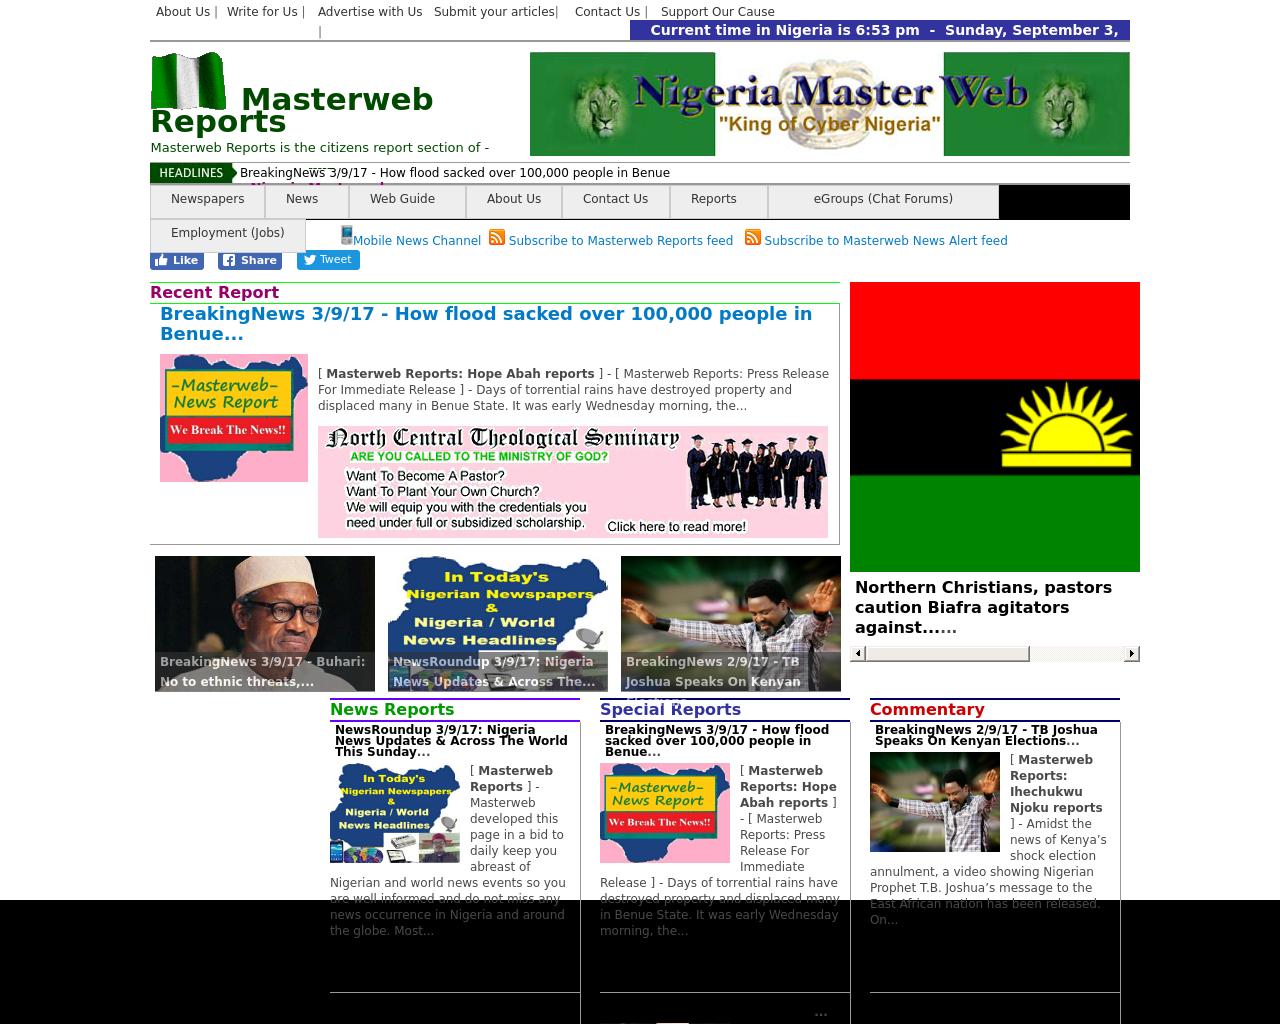 Nigeria-Master-Web-Advertising-Reviews-Pricing